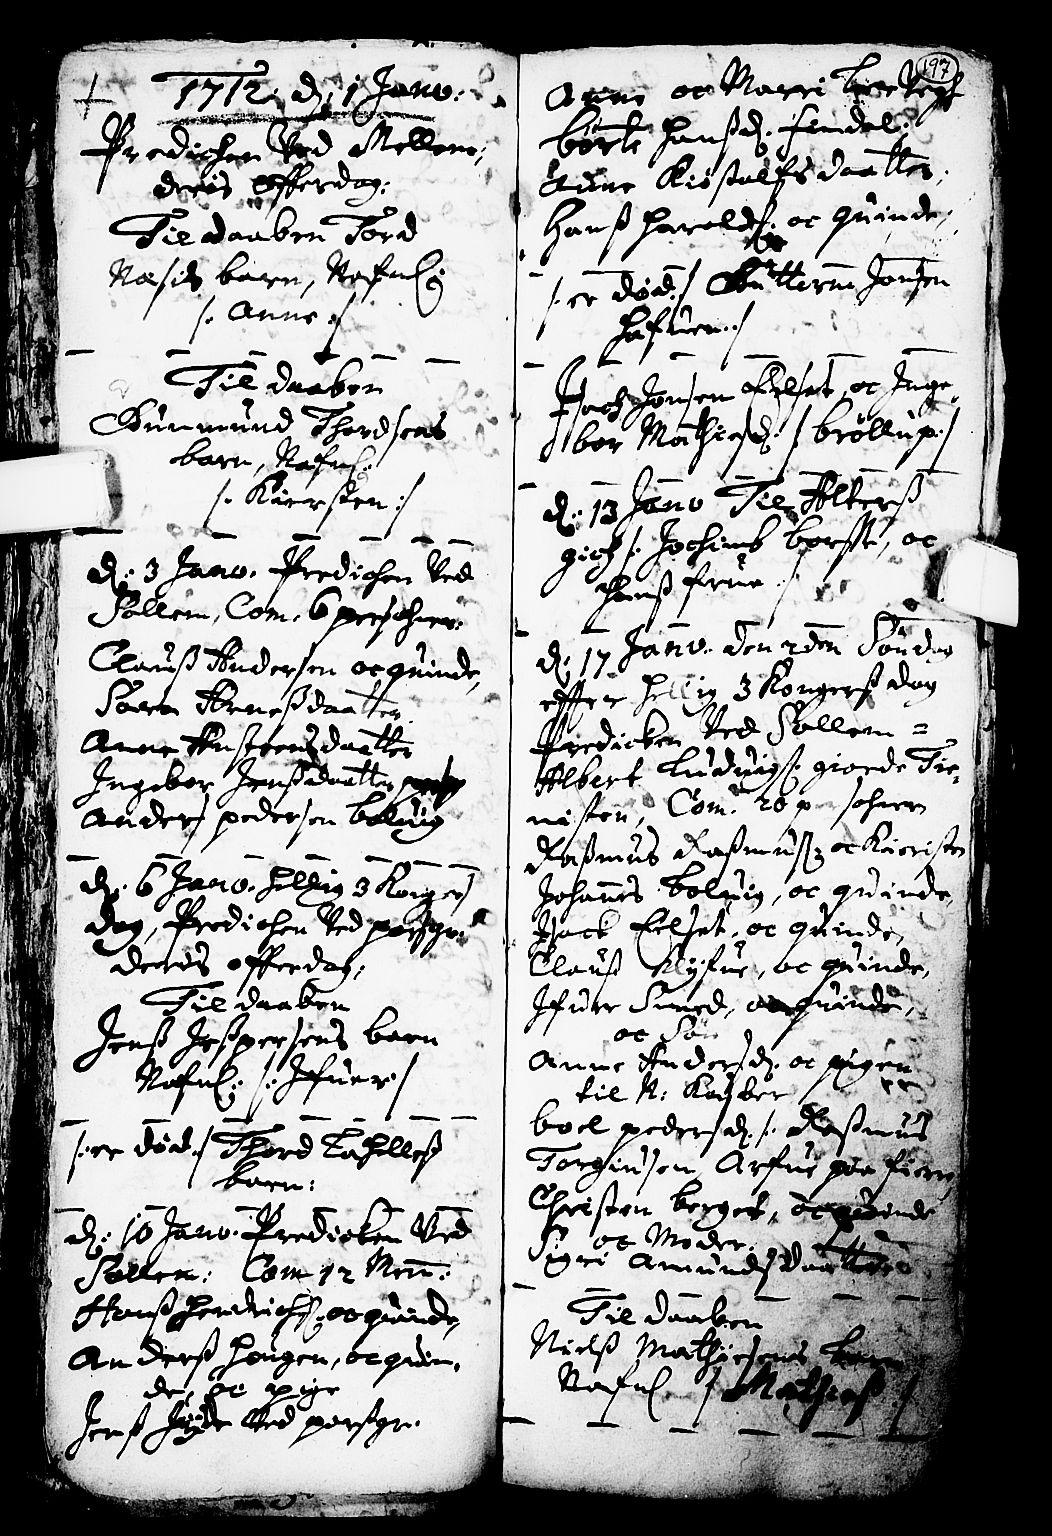 SAKO, Solum kirkebøker, F/Fa/L0001: Ministerialbok nr. I 1, 1701-1716, s. 197